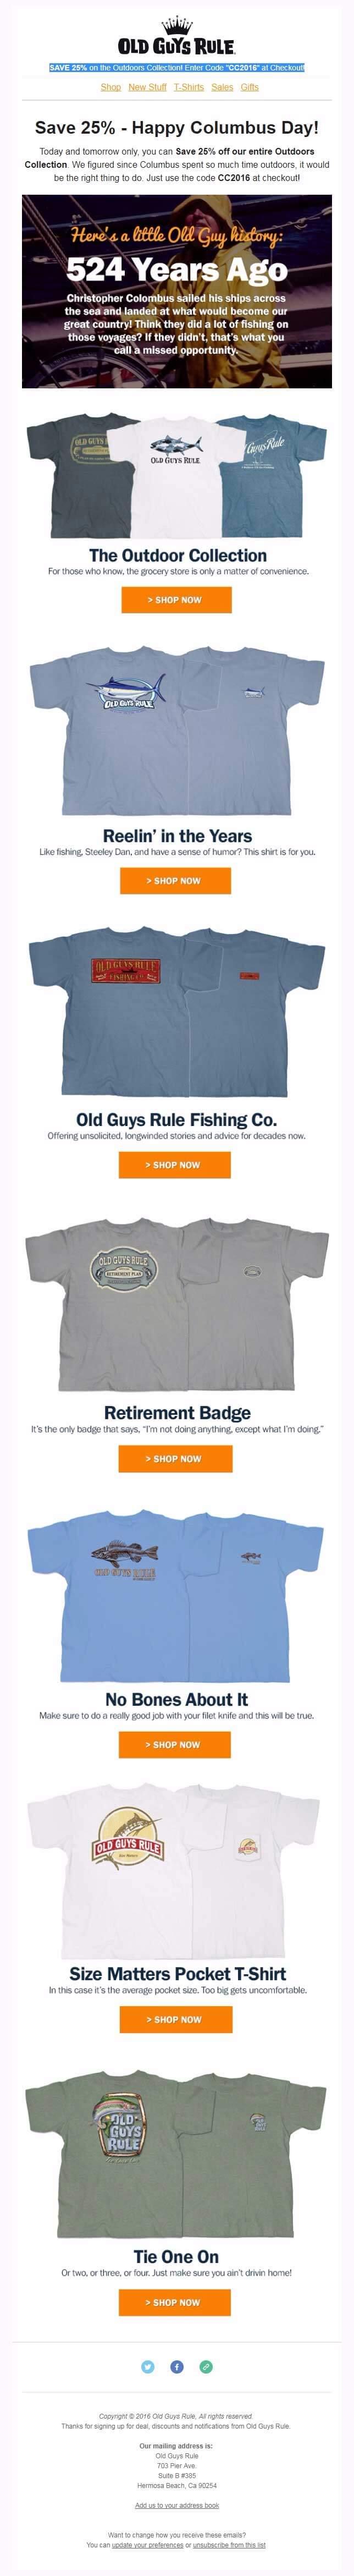 Old-Guys-Rule